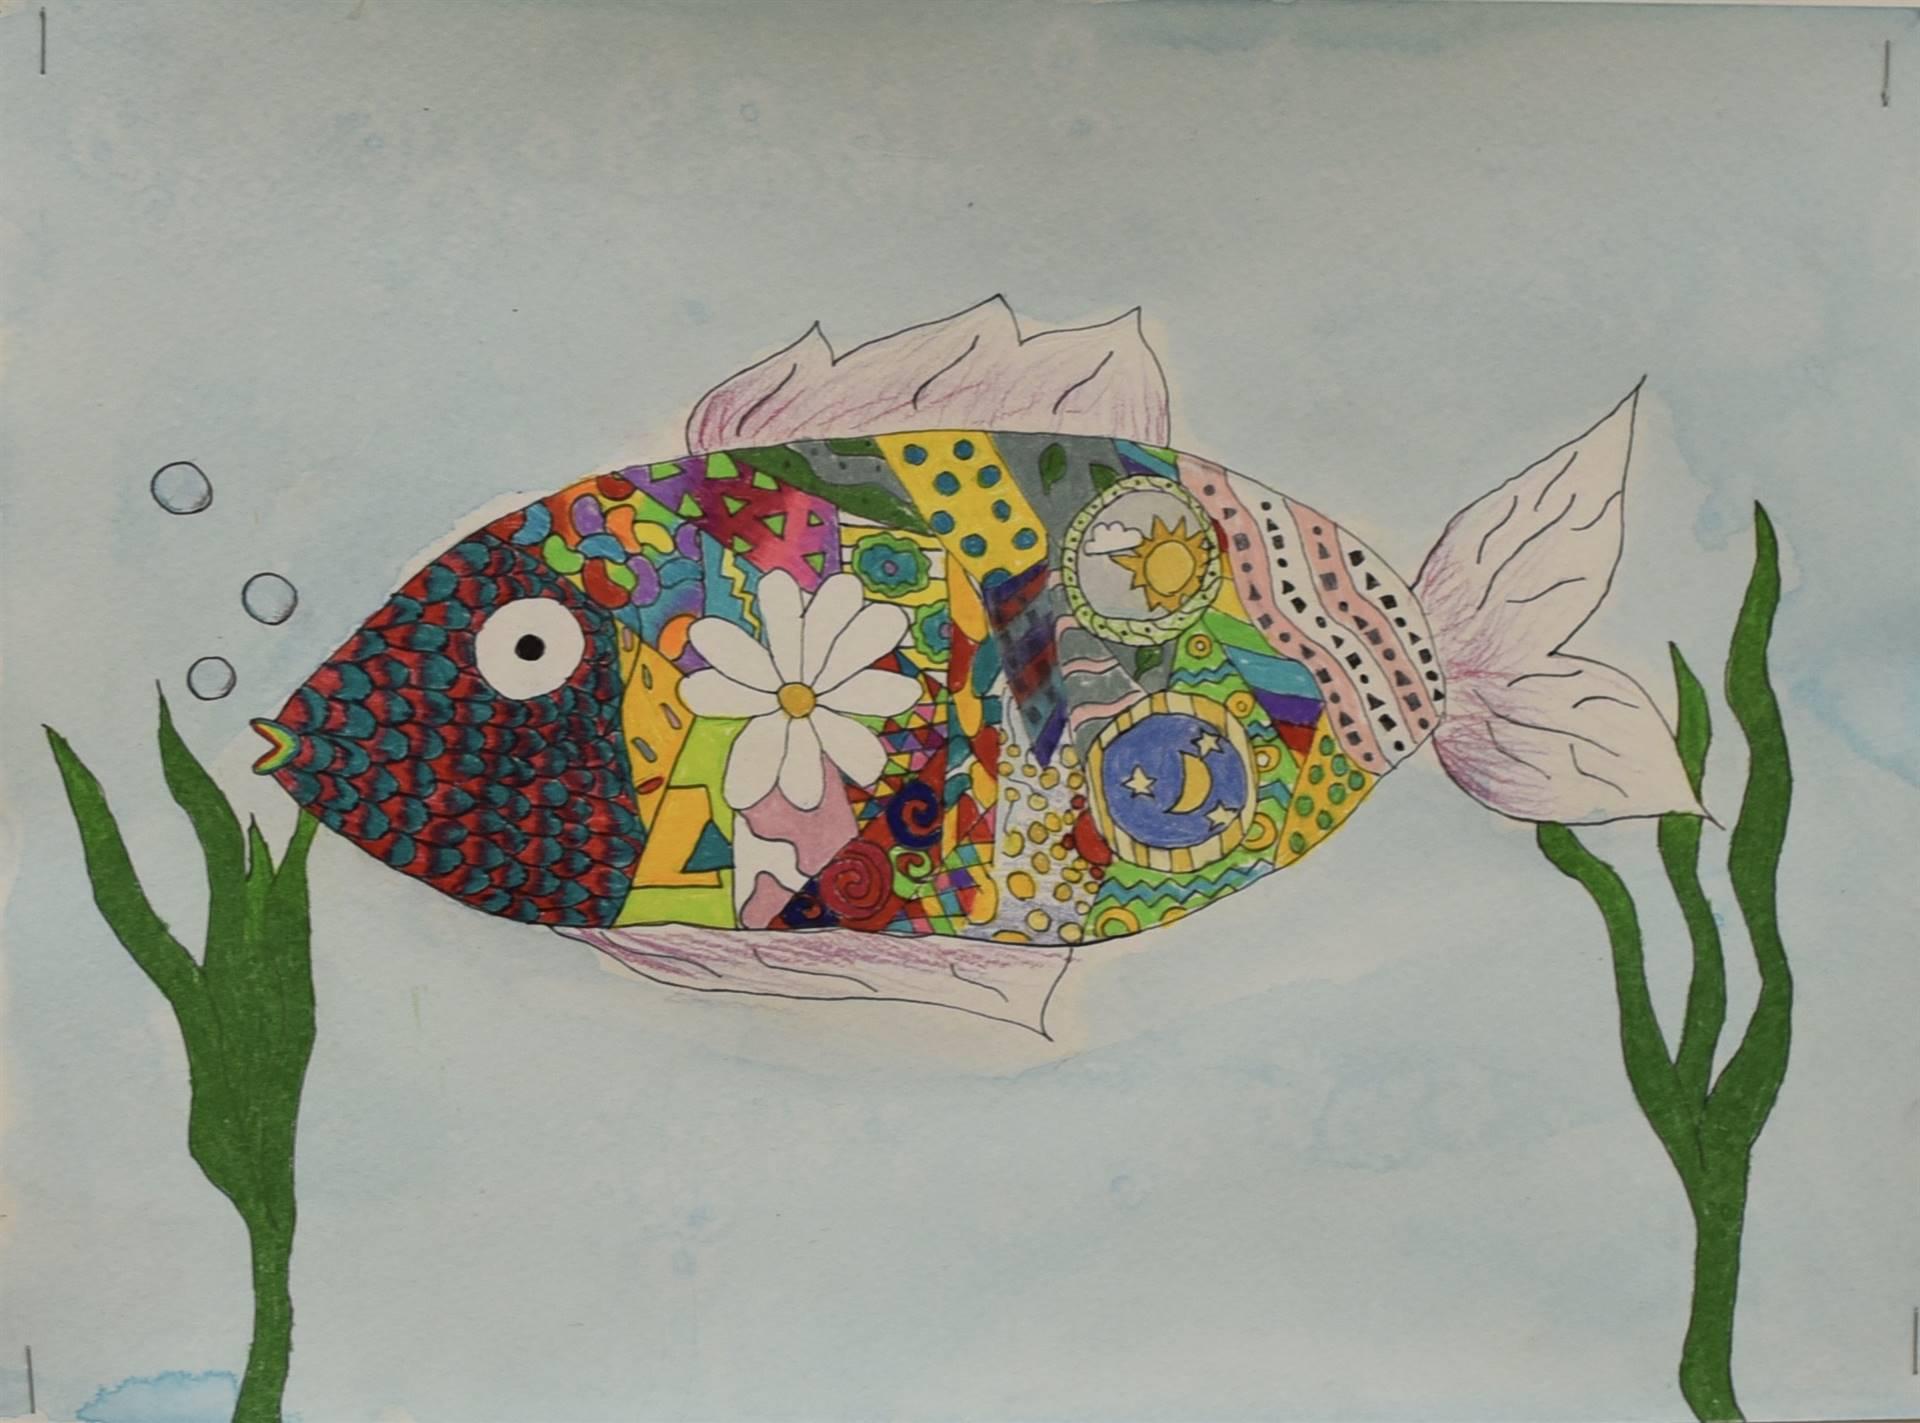 Brecksville-Broadview Hts. Middle School Art Projects 131